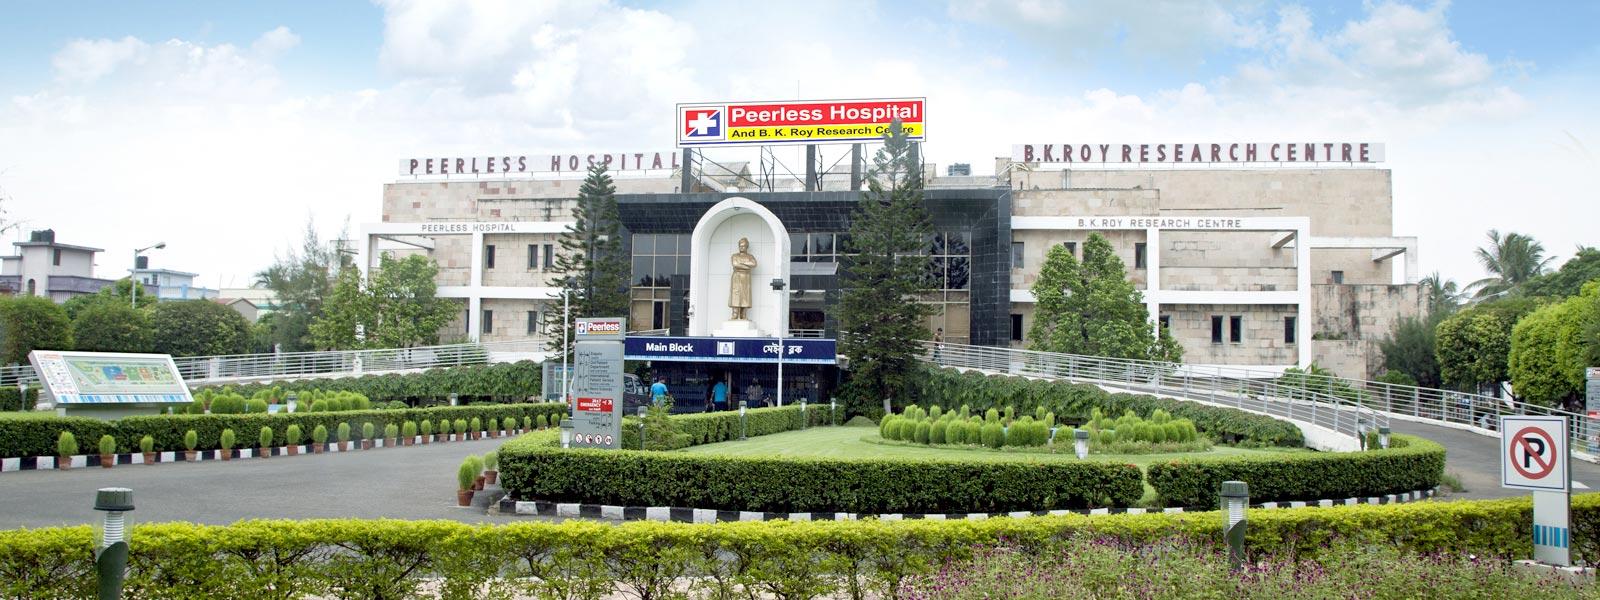 Peerless College Of Nursing, Kolkata Image